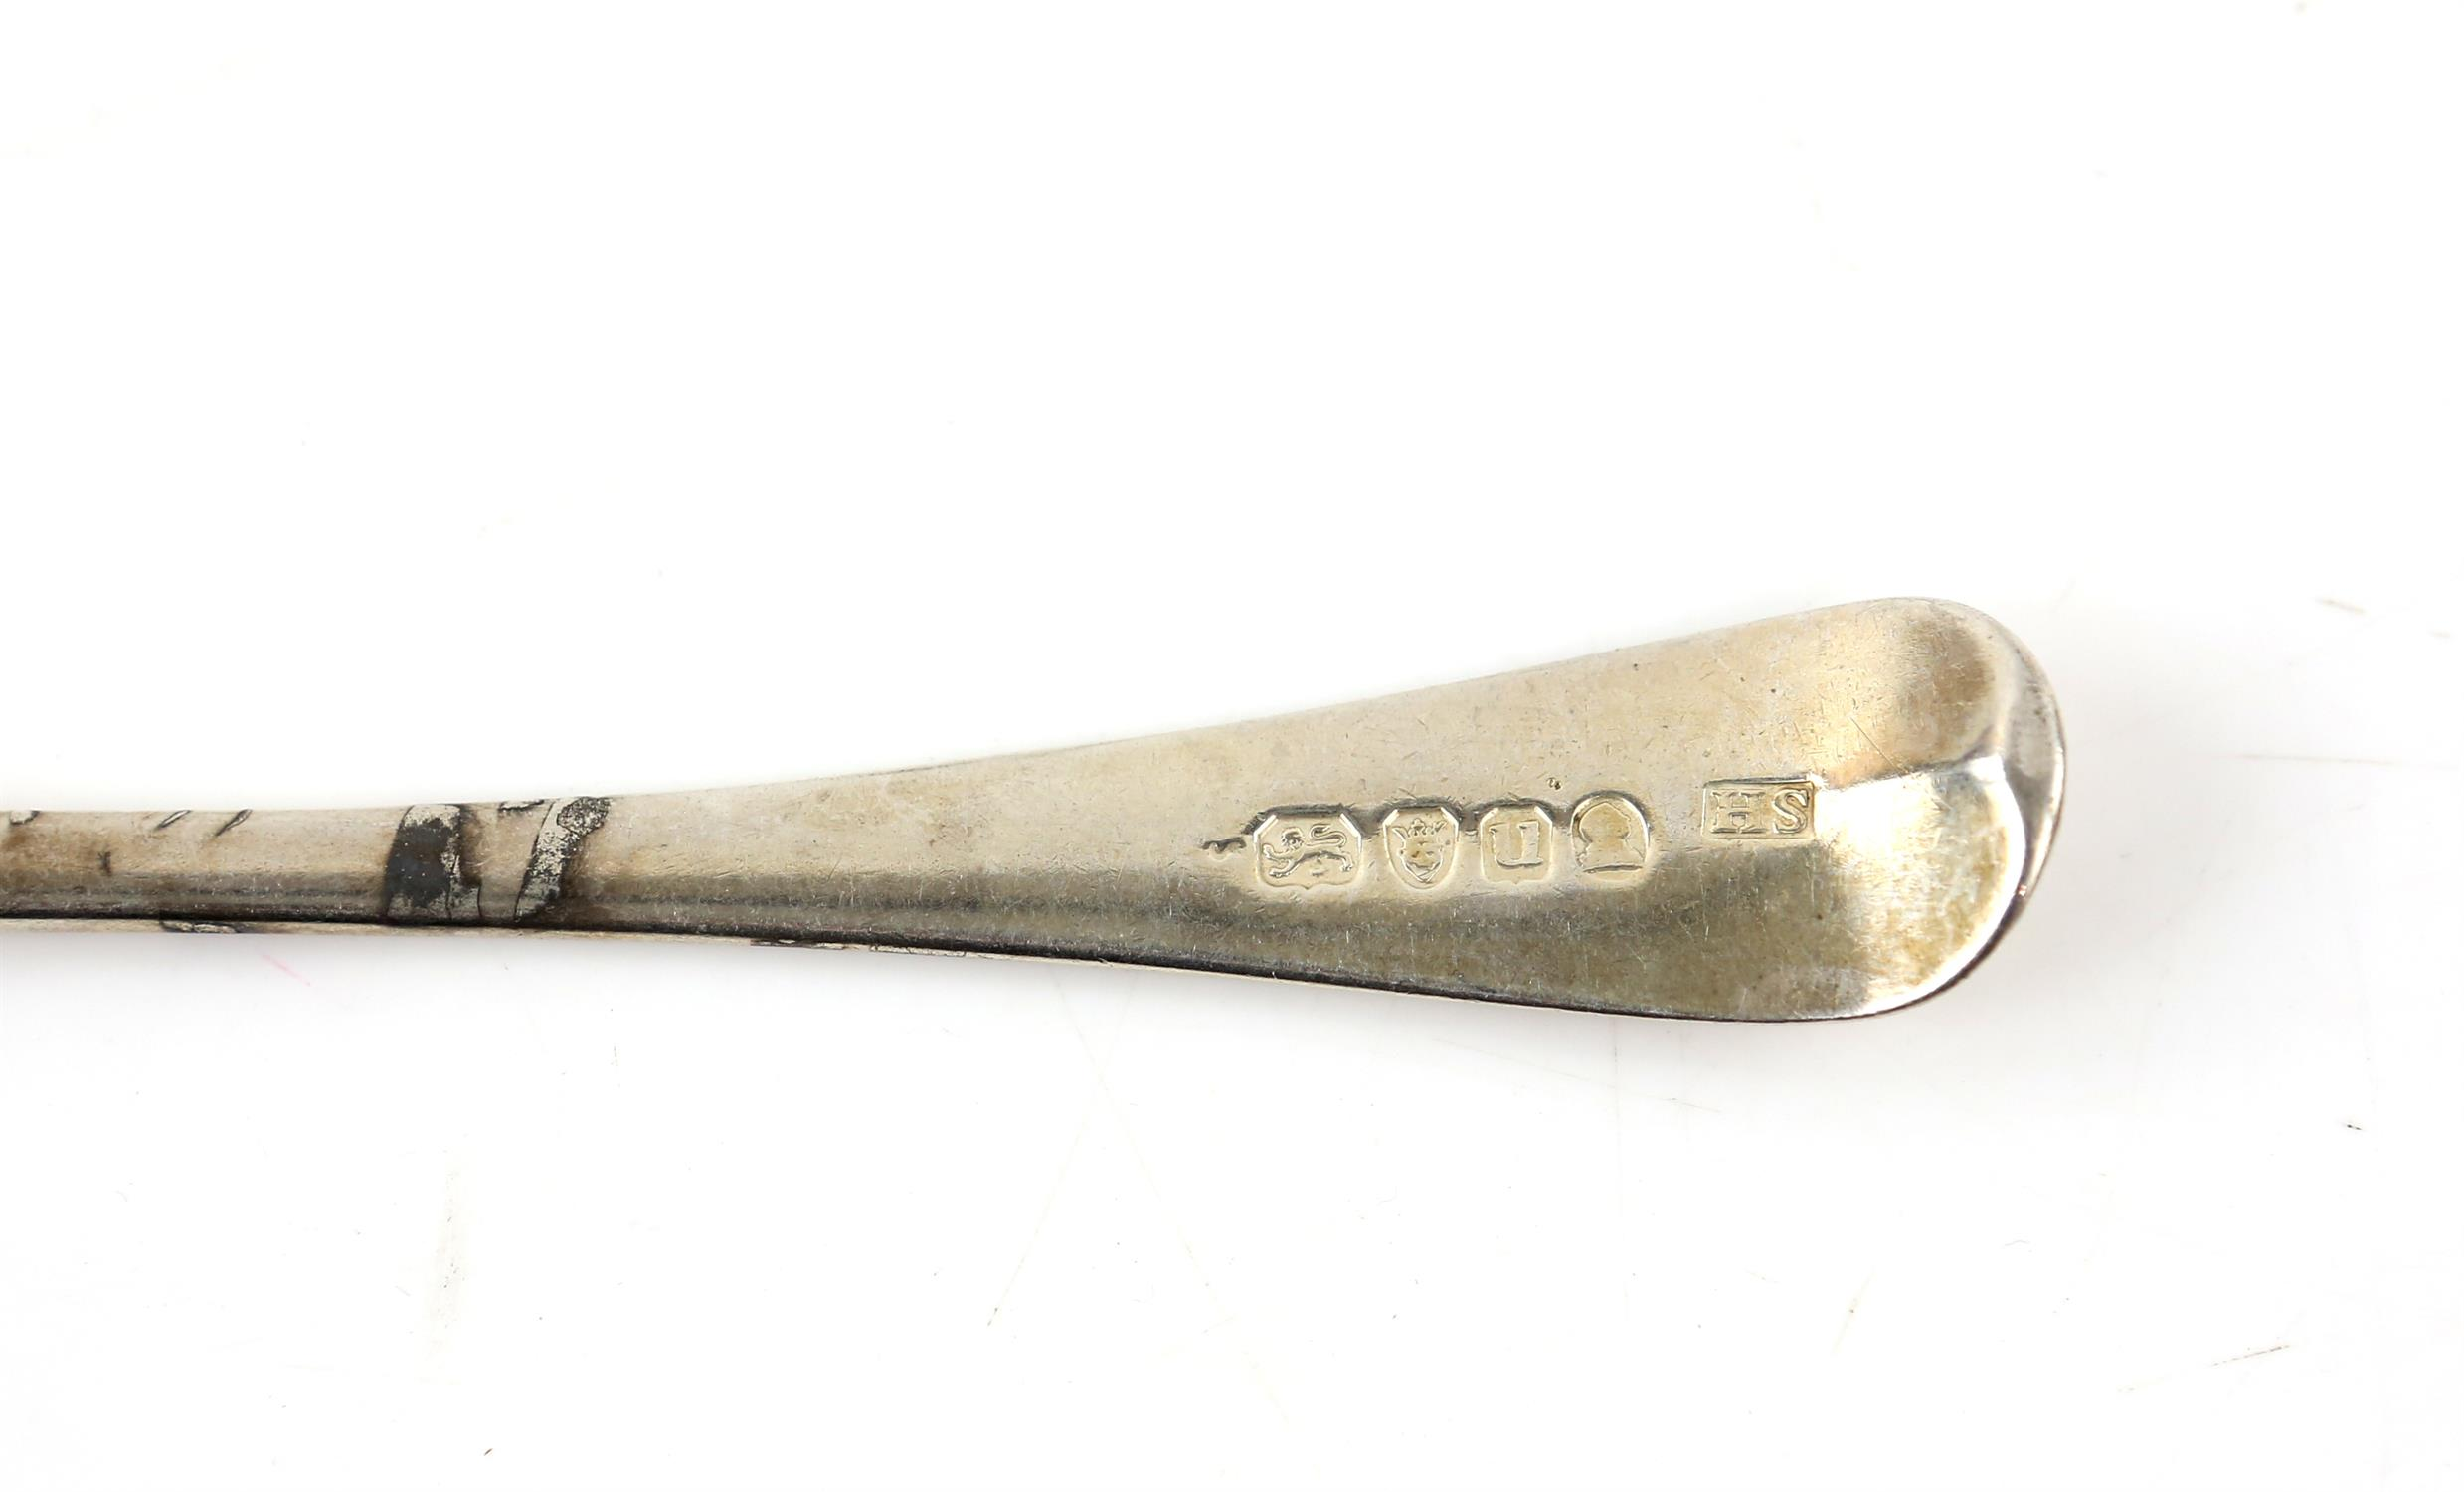 Set of 8 George III old English pattern dessert forks London 1795 Makers Mark HS, 10 ozs - Image 3 of 4